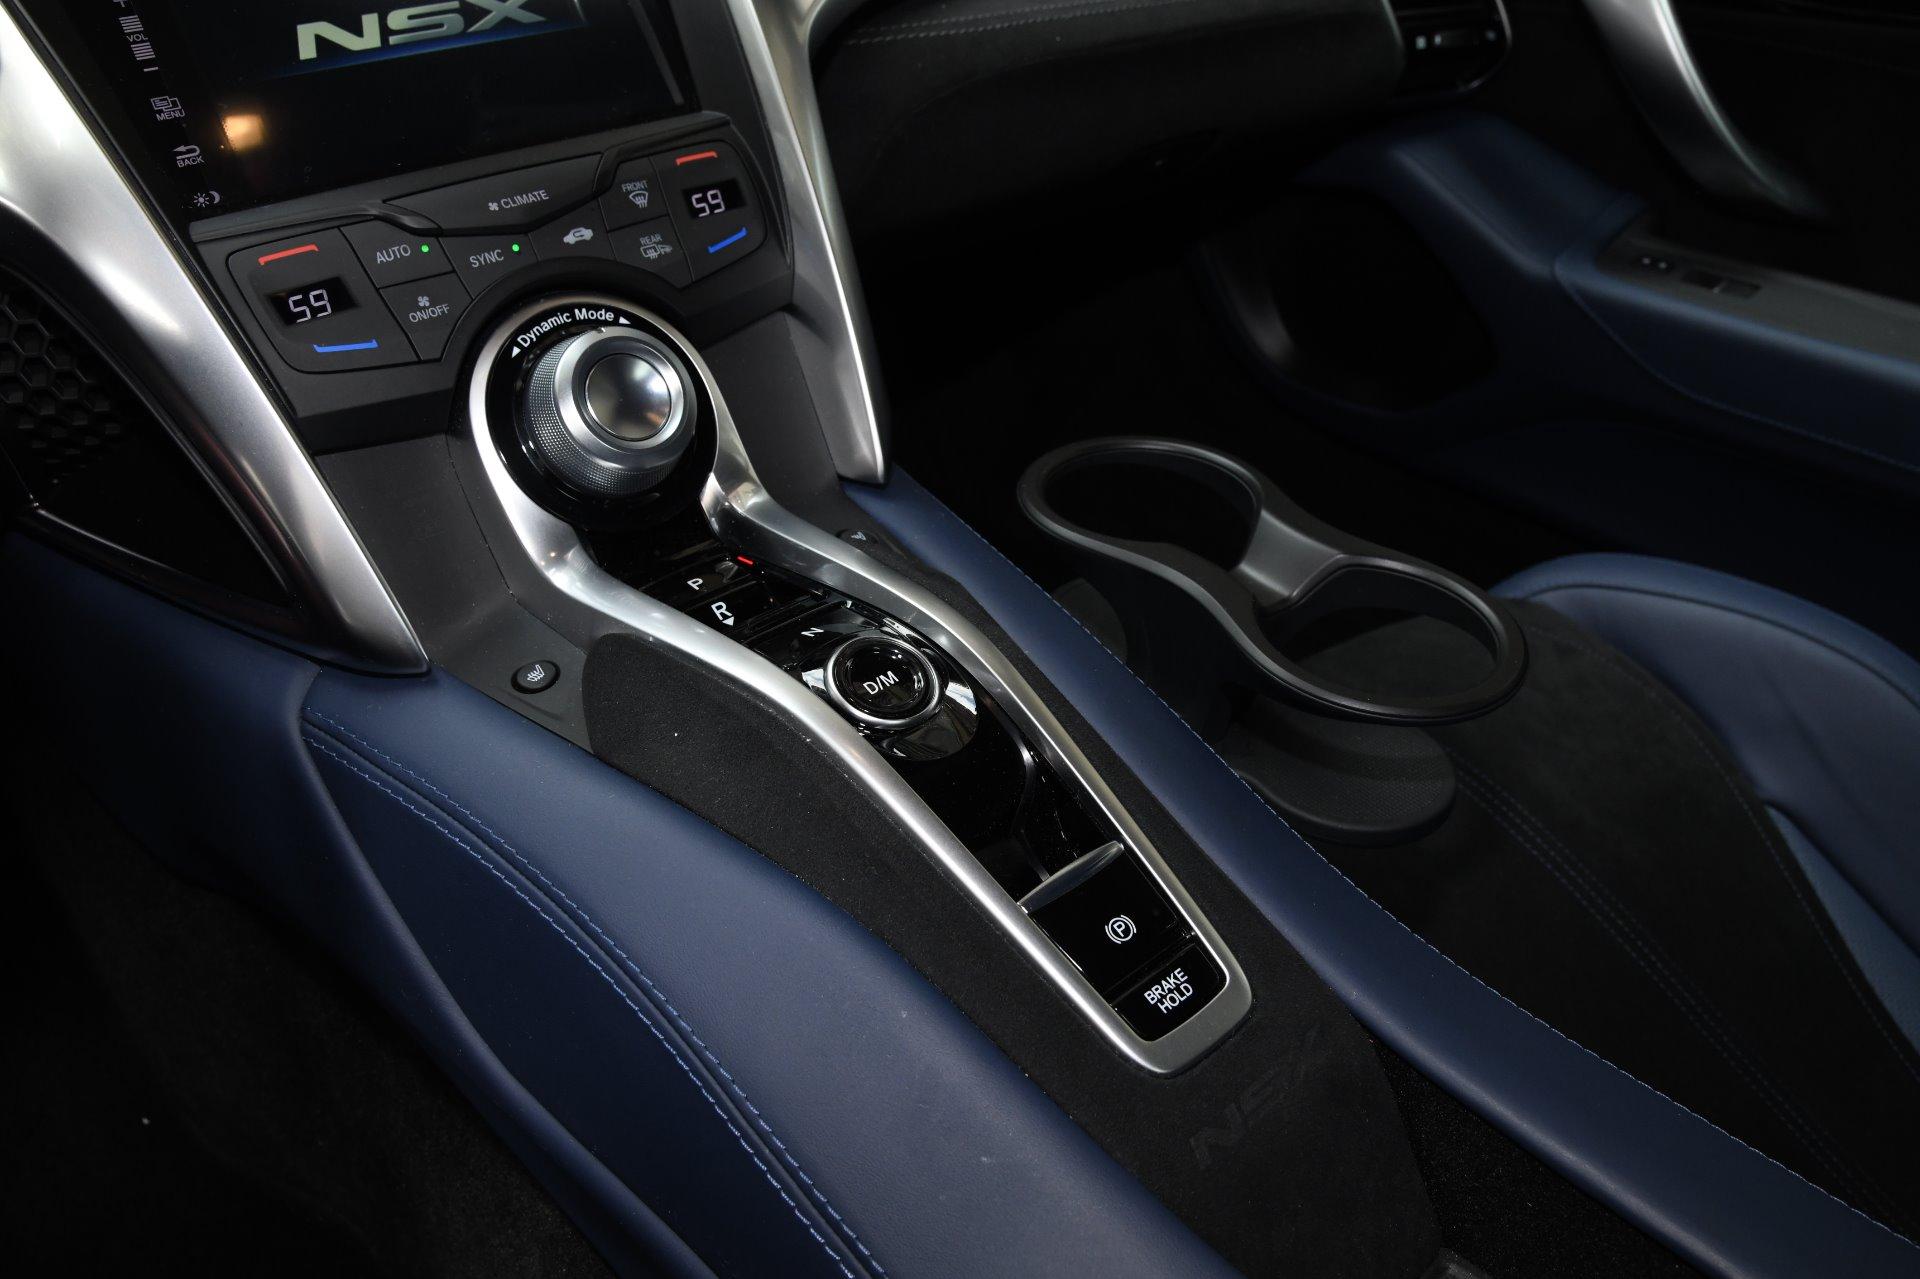 Used 2019 Acura NSX SH-AWD Sport Hybrid | Chicago, IL